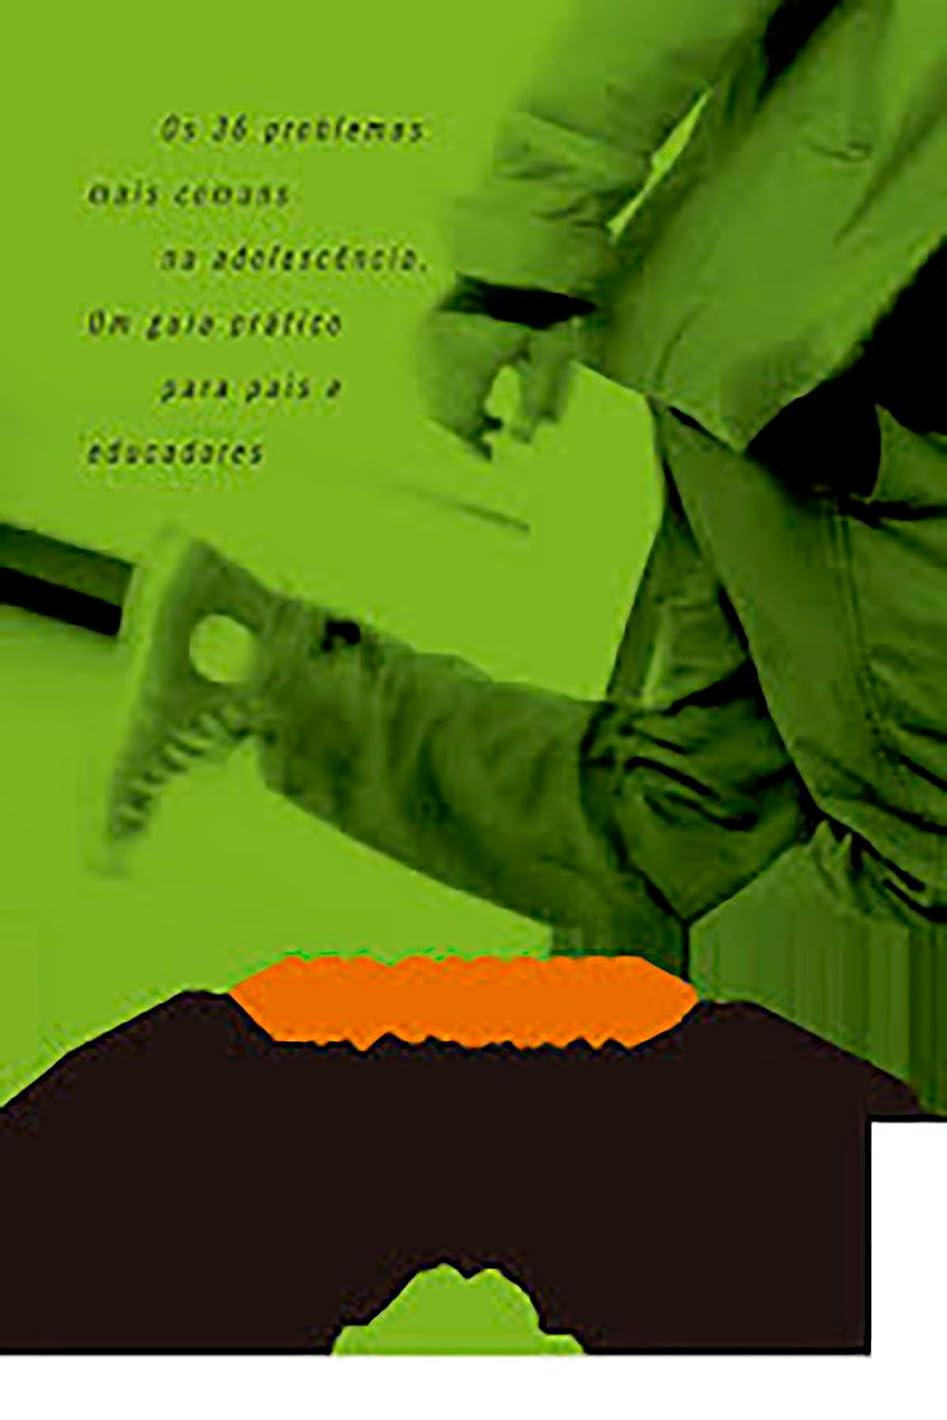 うまくいけば貝殻破滅Adolescentes em conflito: Os 36 problemas mais comuns na adolescência: um guia prático para pais e educadores (Portuguese Edition)